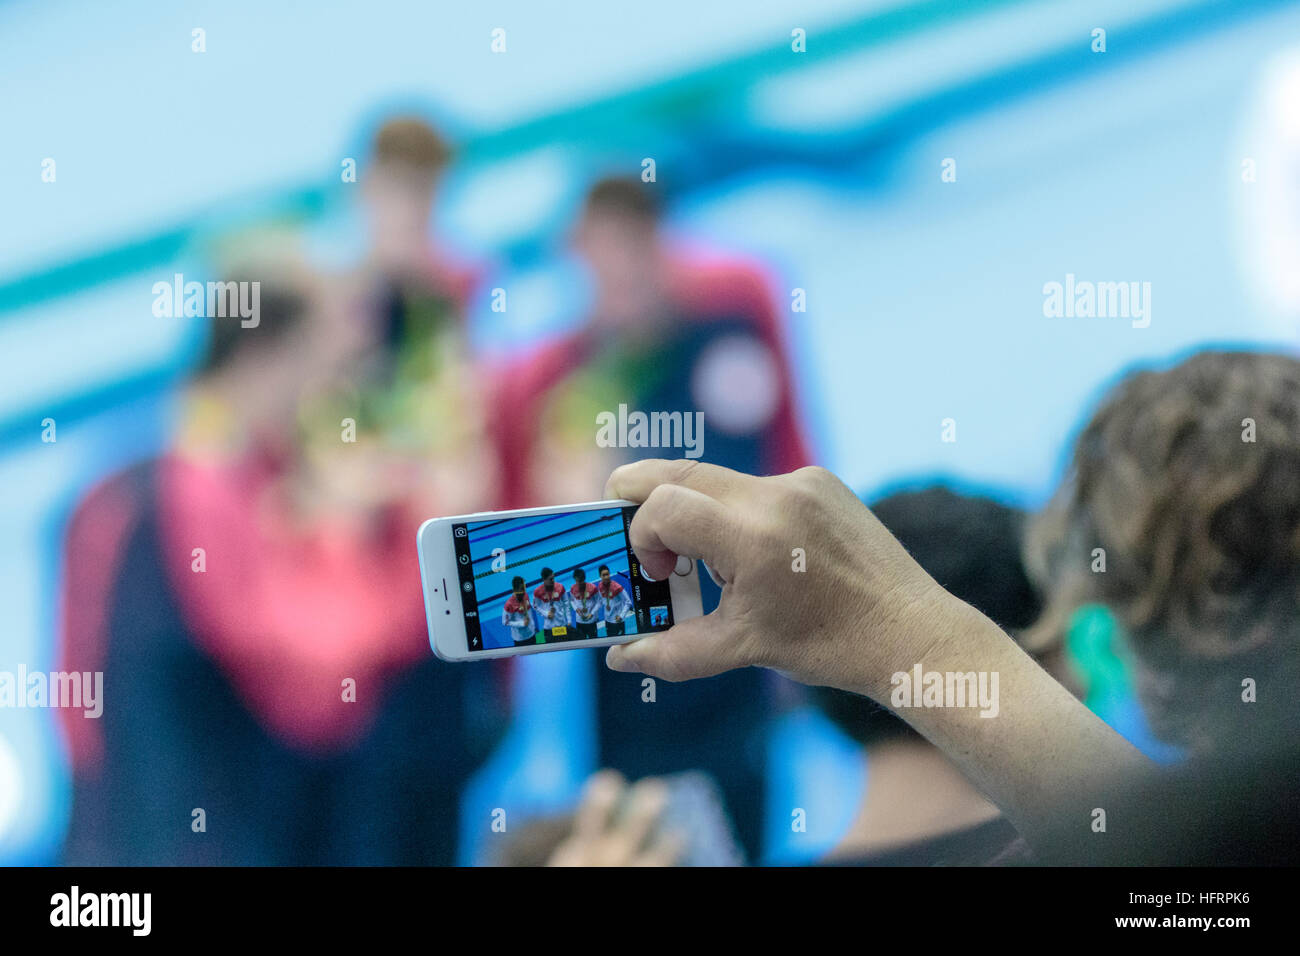 Río de Janeiro, Brasil. El 9 de agosto de 2016. El espectador a través de teléfono móvil para Imagen De Stock